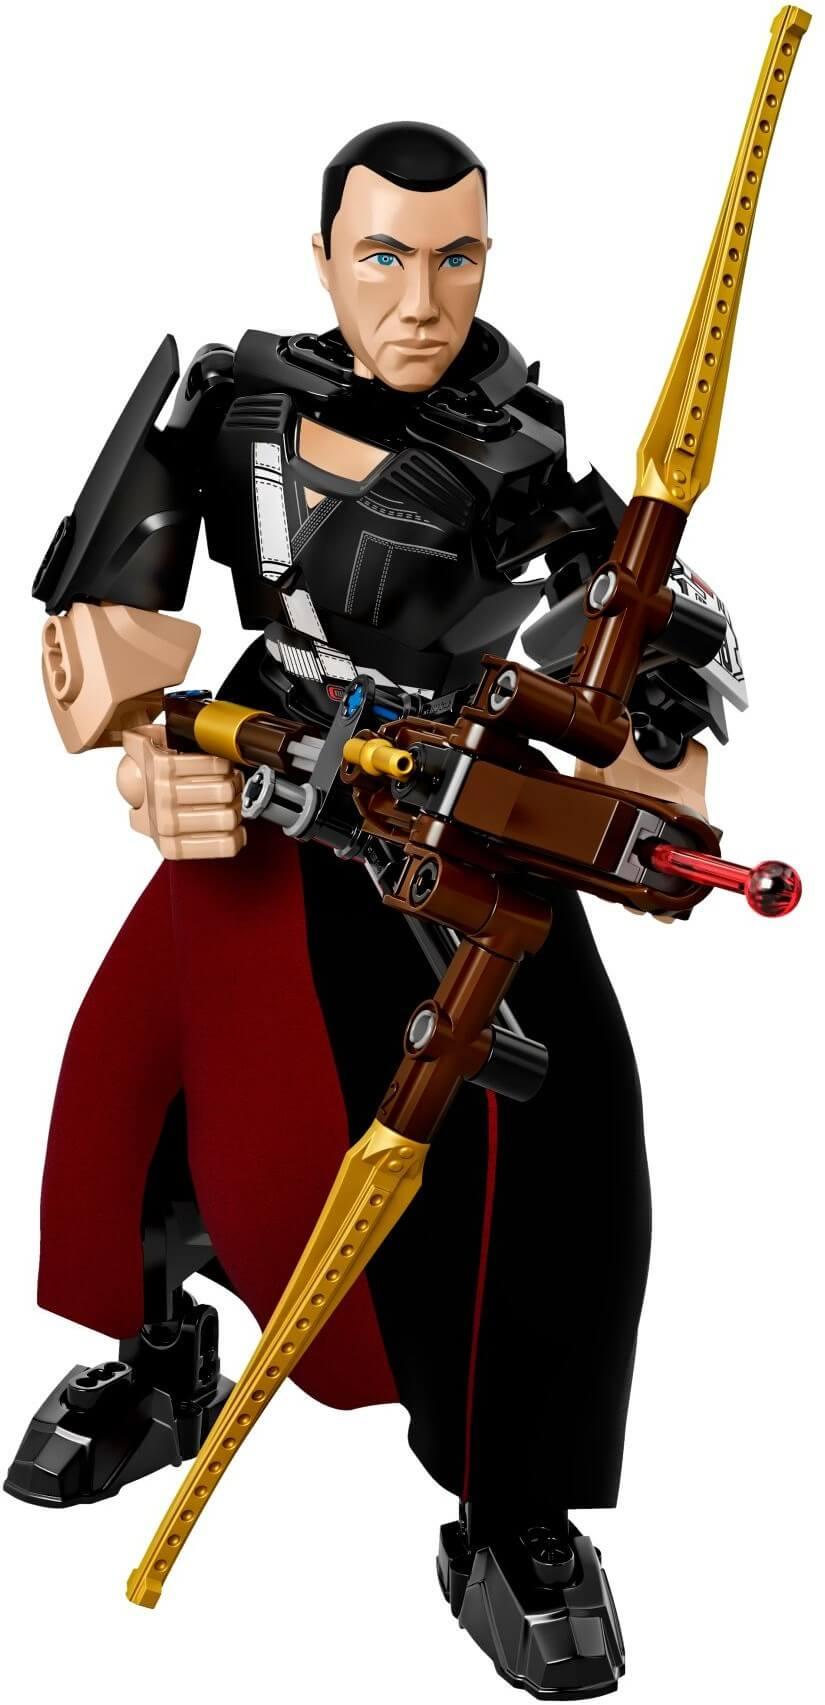 Mua đồ chơi LEGO 75524 - LEGO Star Wars 75524 - Chirrut Îmwe (LEGO 75524 Chirrut Îmwe)